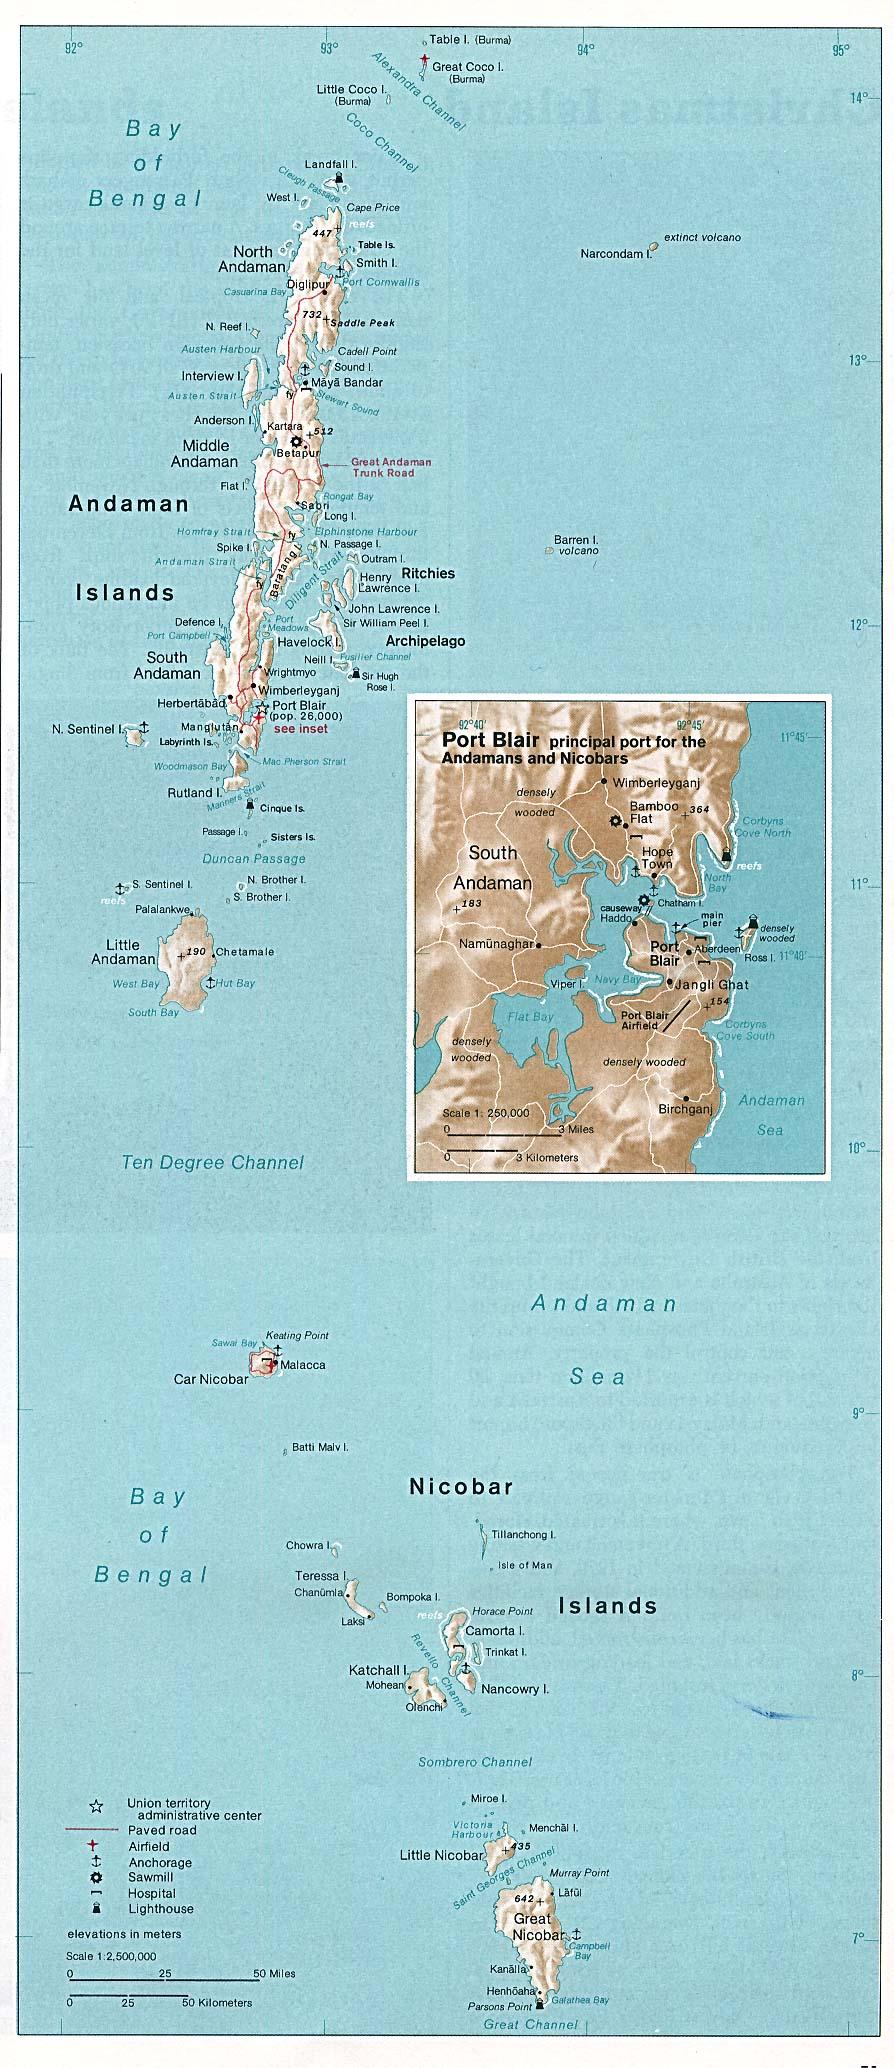 https://upload.wikimedia.org/wikipedia/commons/0/02/Andaman_nicobar_76.jpg